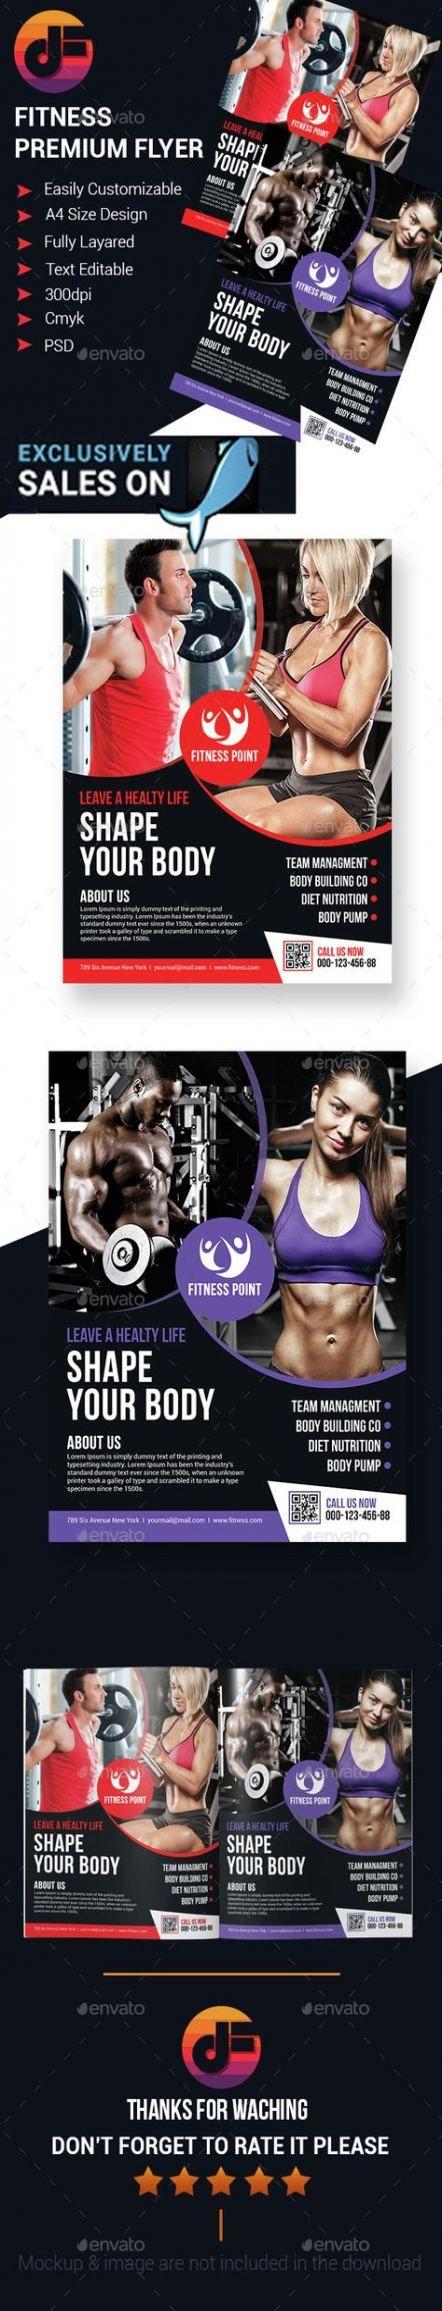 Best Fitness Poster Design Ideas Flyer Template Ideas #fitness #design